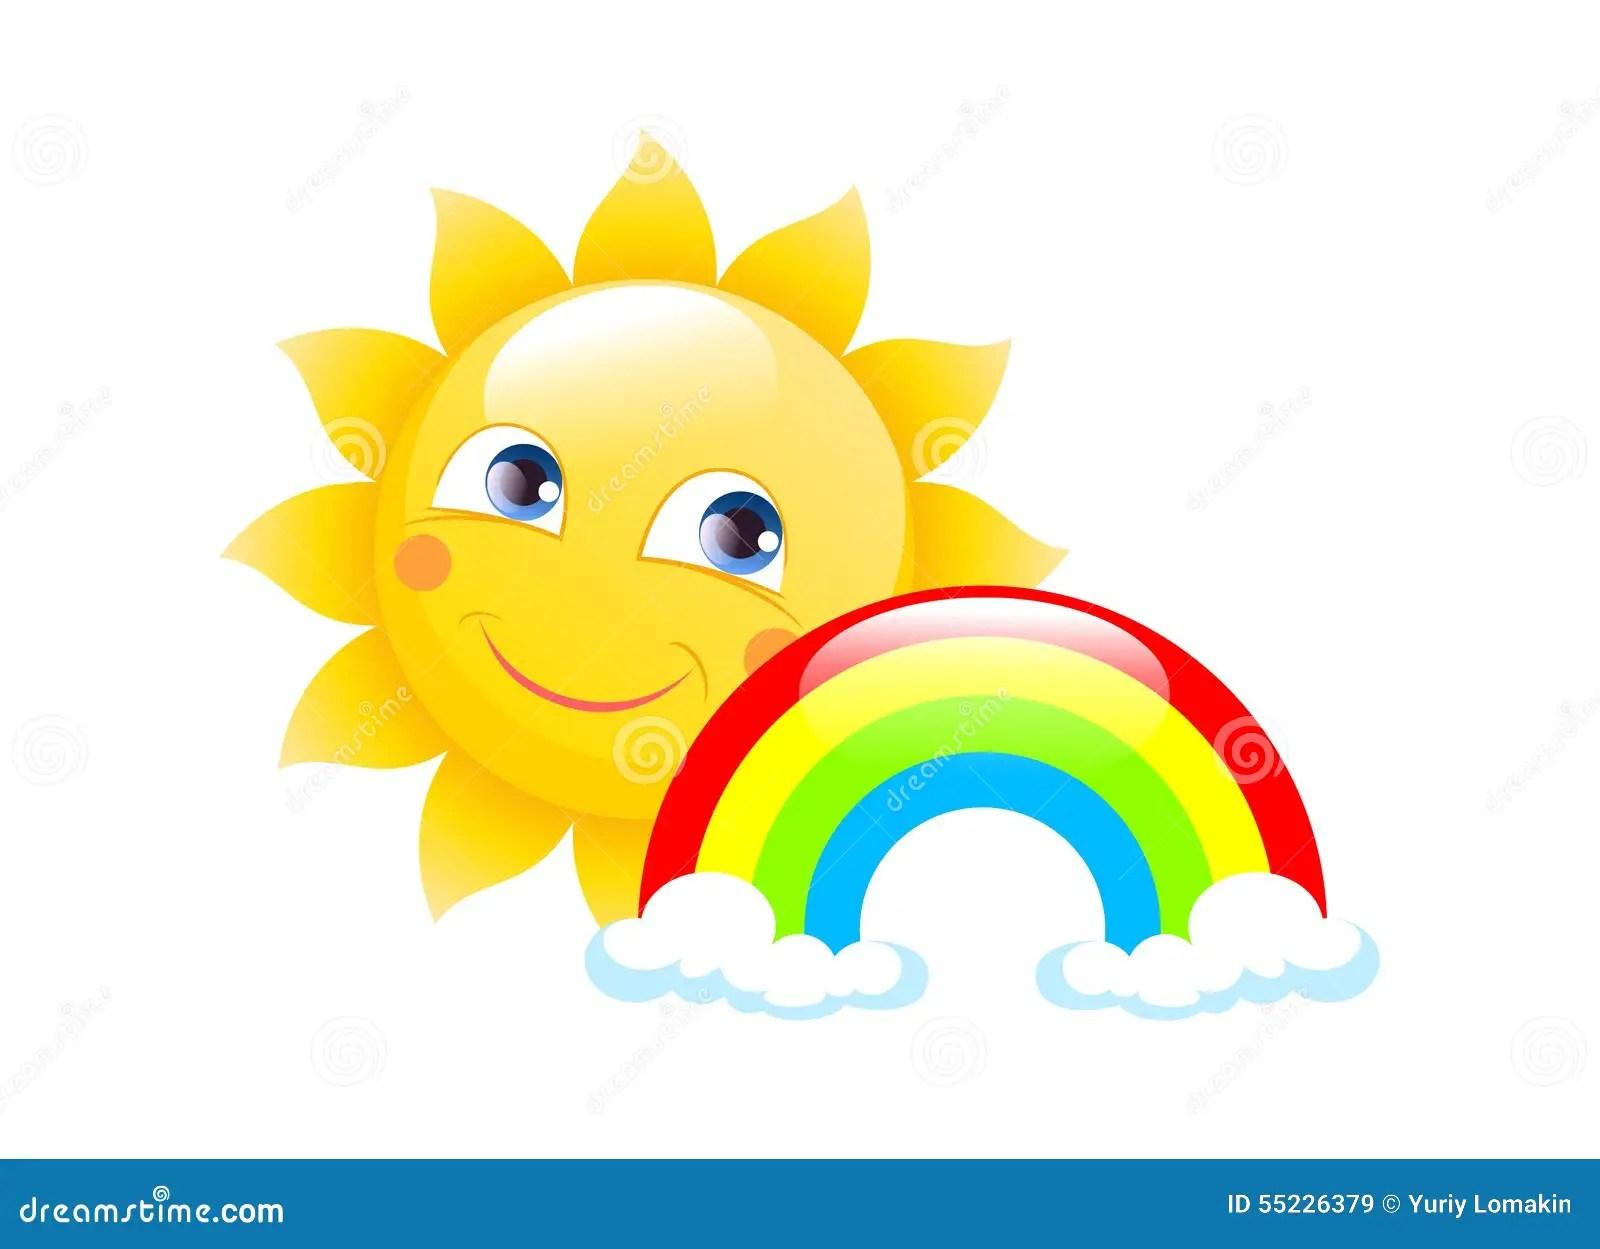 Sun Logo On A White Background Stock Illustration